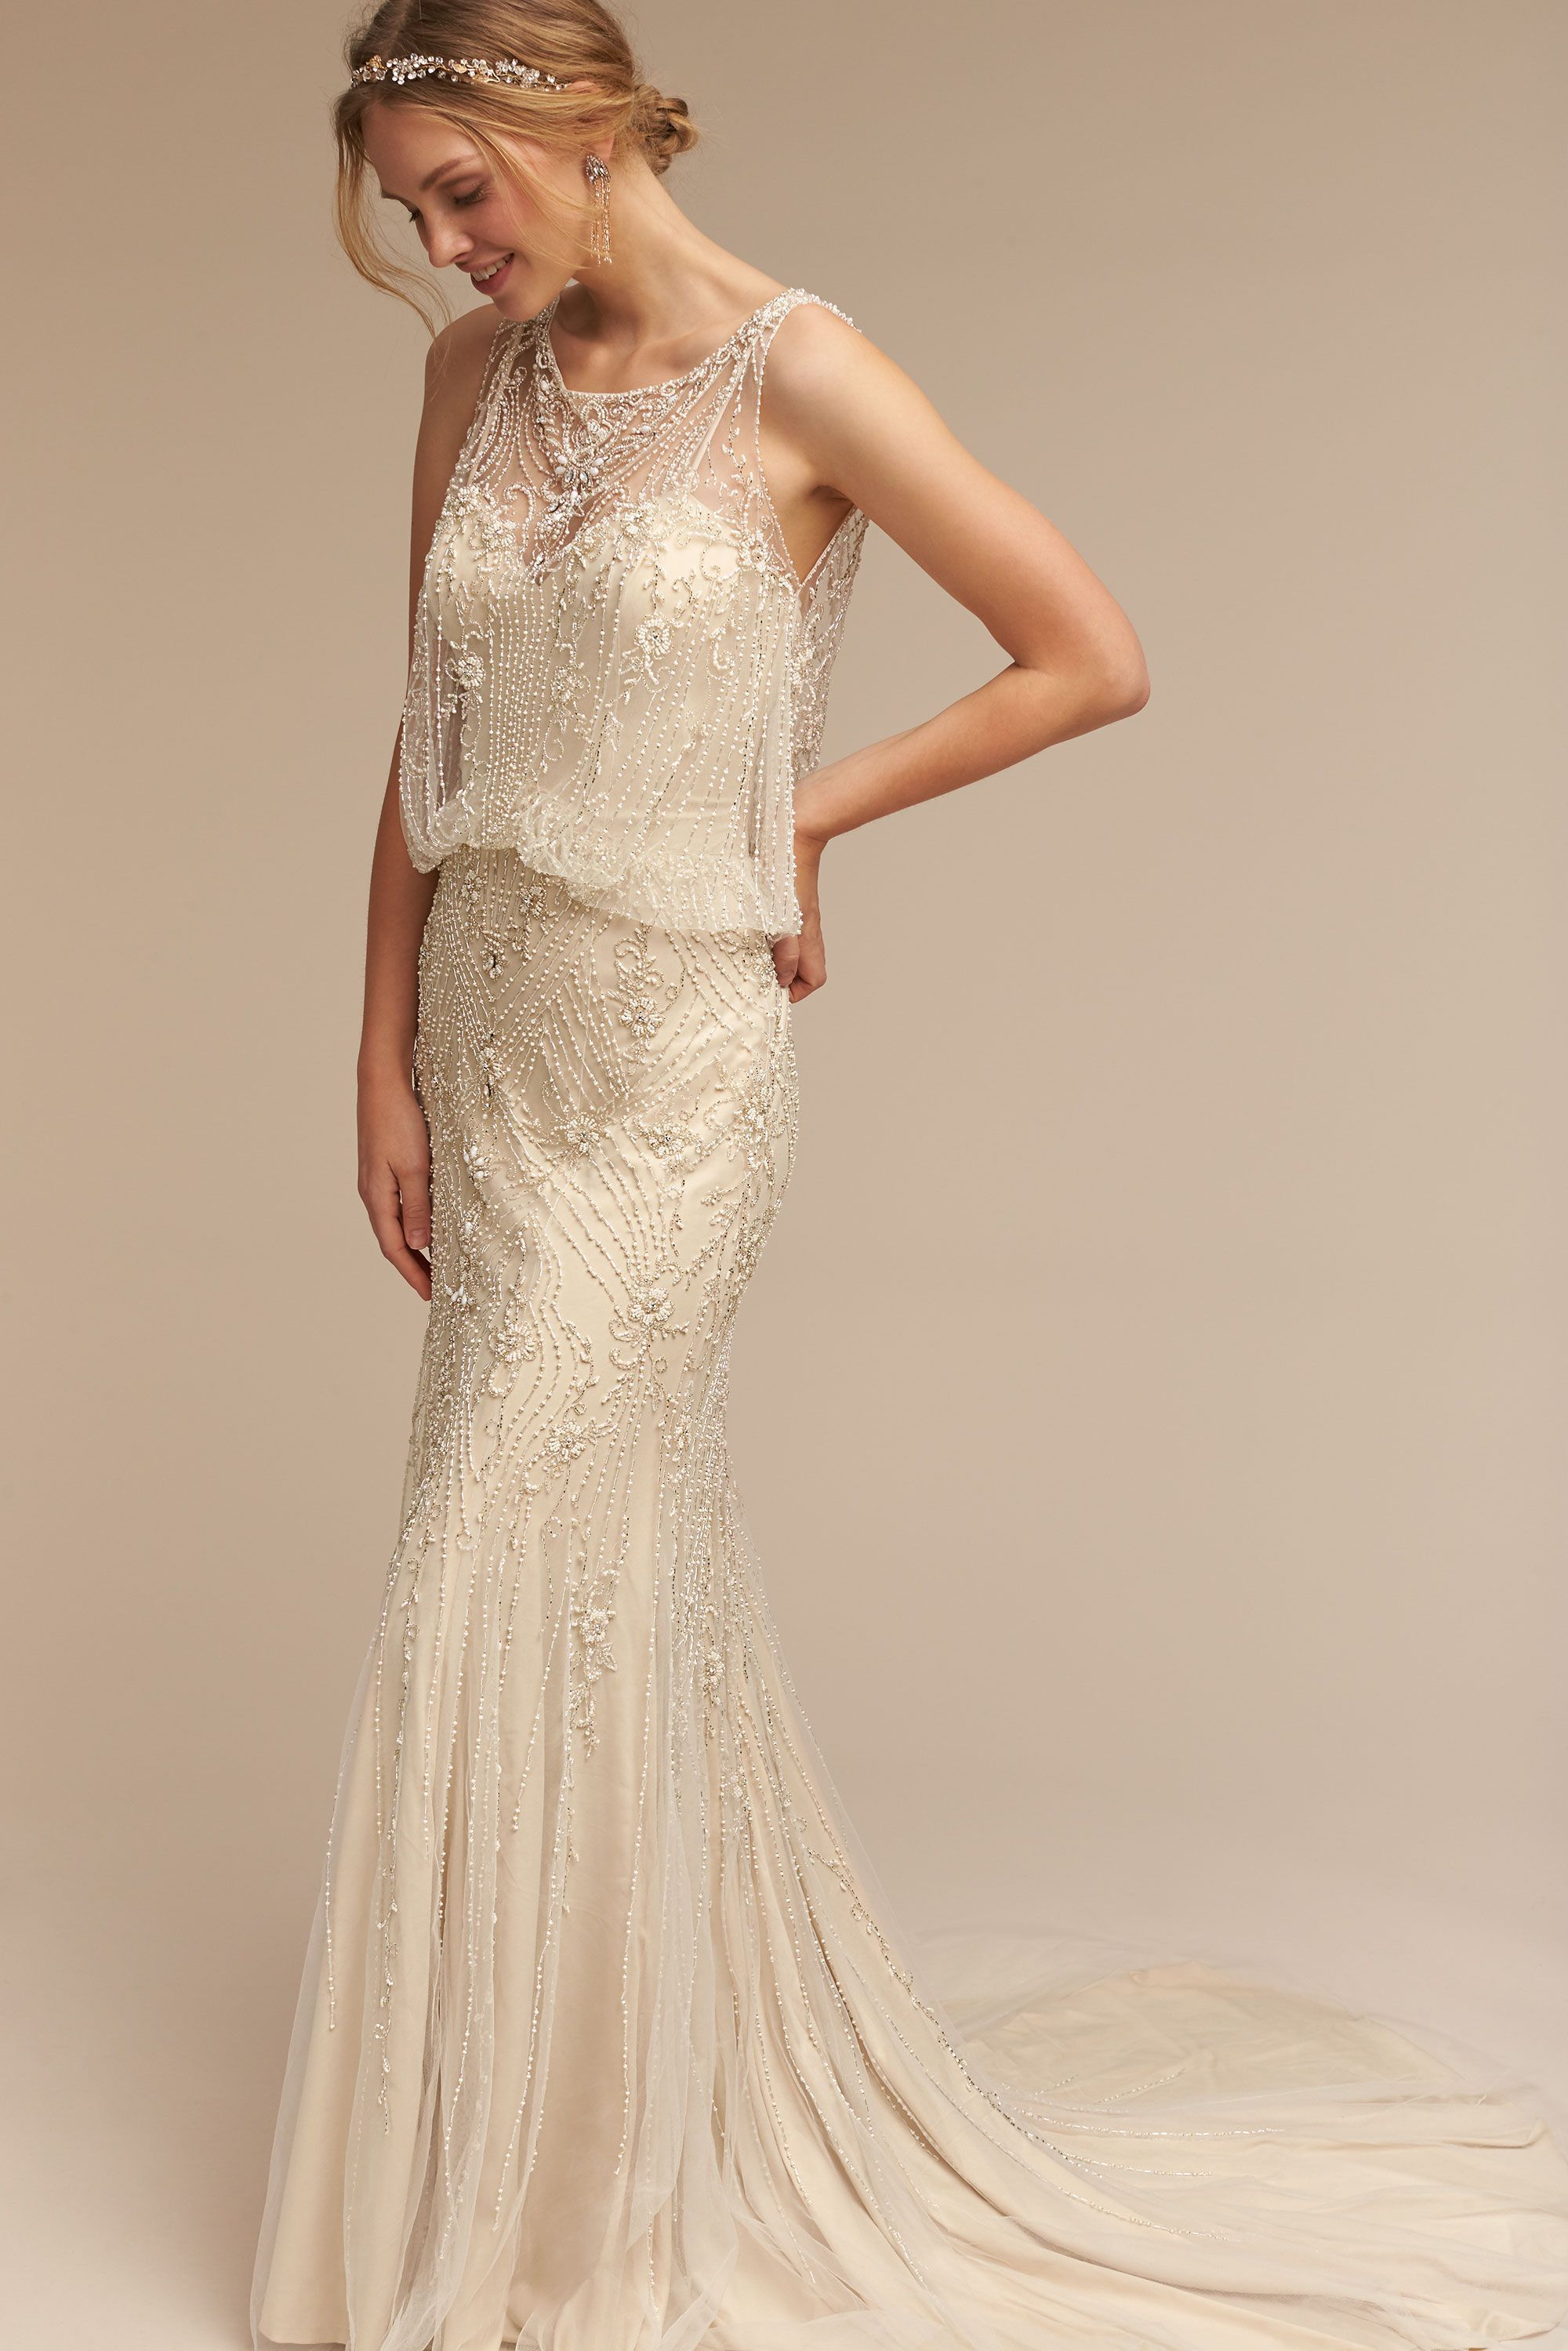 Pin de Angeles Graham en Brides | Pinterest | Vestiditos, Ropa linda ...